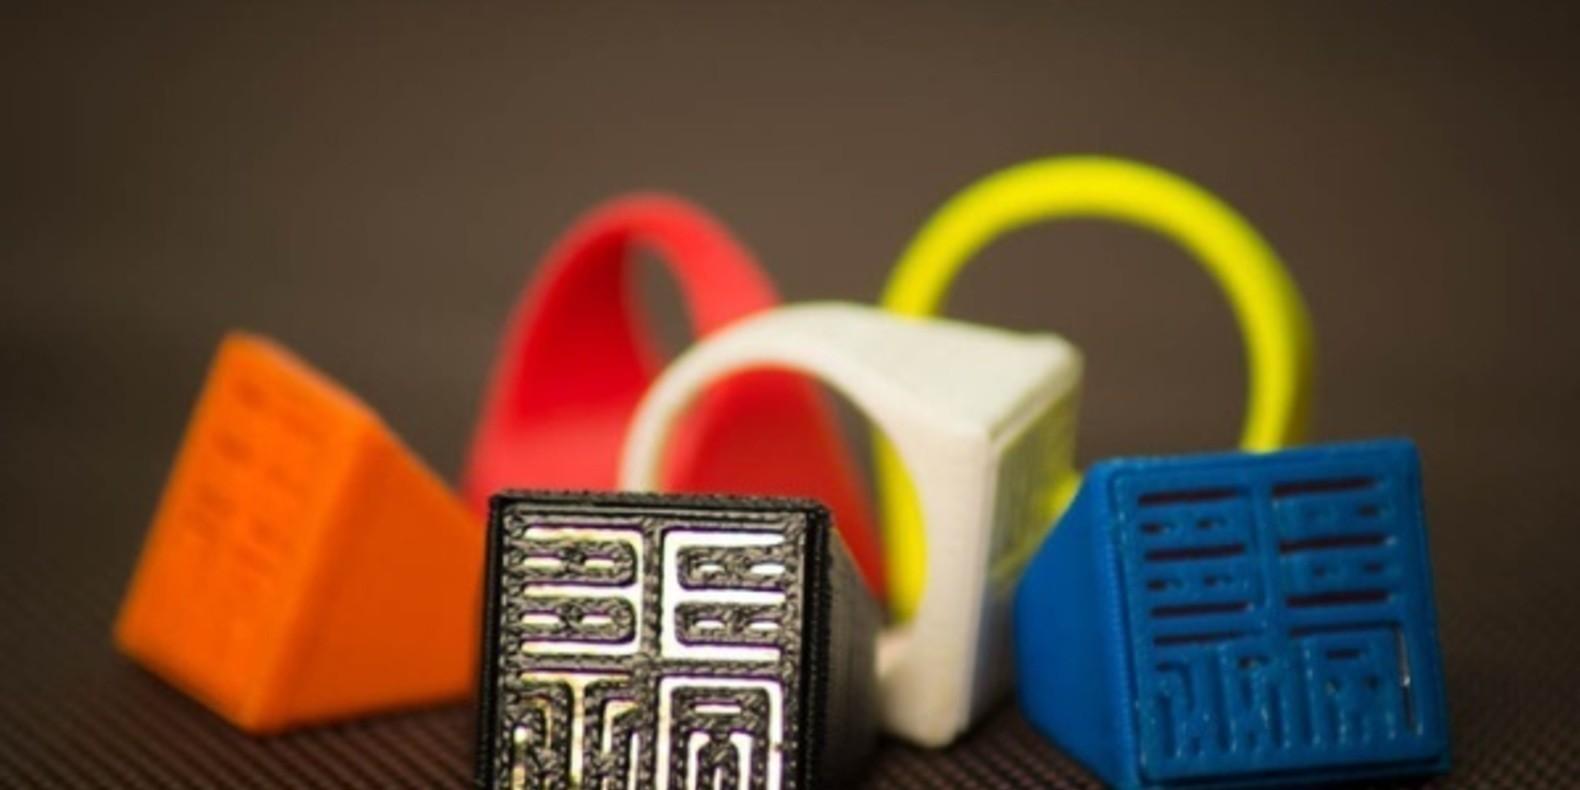 sesame ring theory 3D printed bague imprimée en 3D cults3D fichier 3D kickstarter boston MIT 1